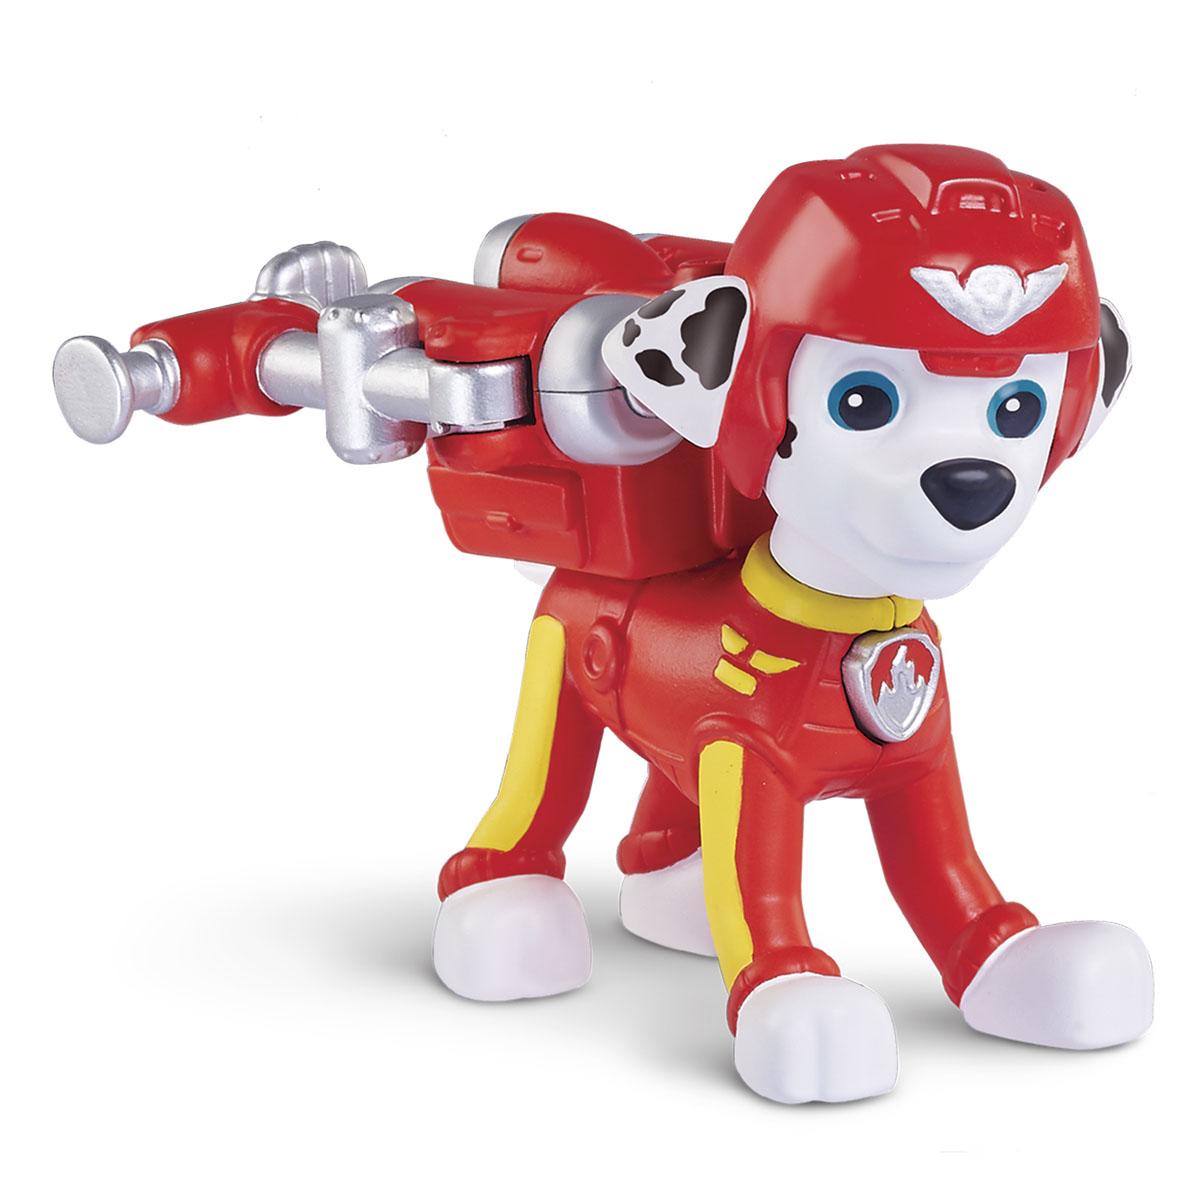 Paw Patrol Фигурка Воздушный спасатель Marshall paw patrol фигурка щенок спасатель marshall